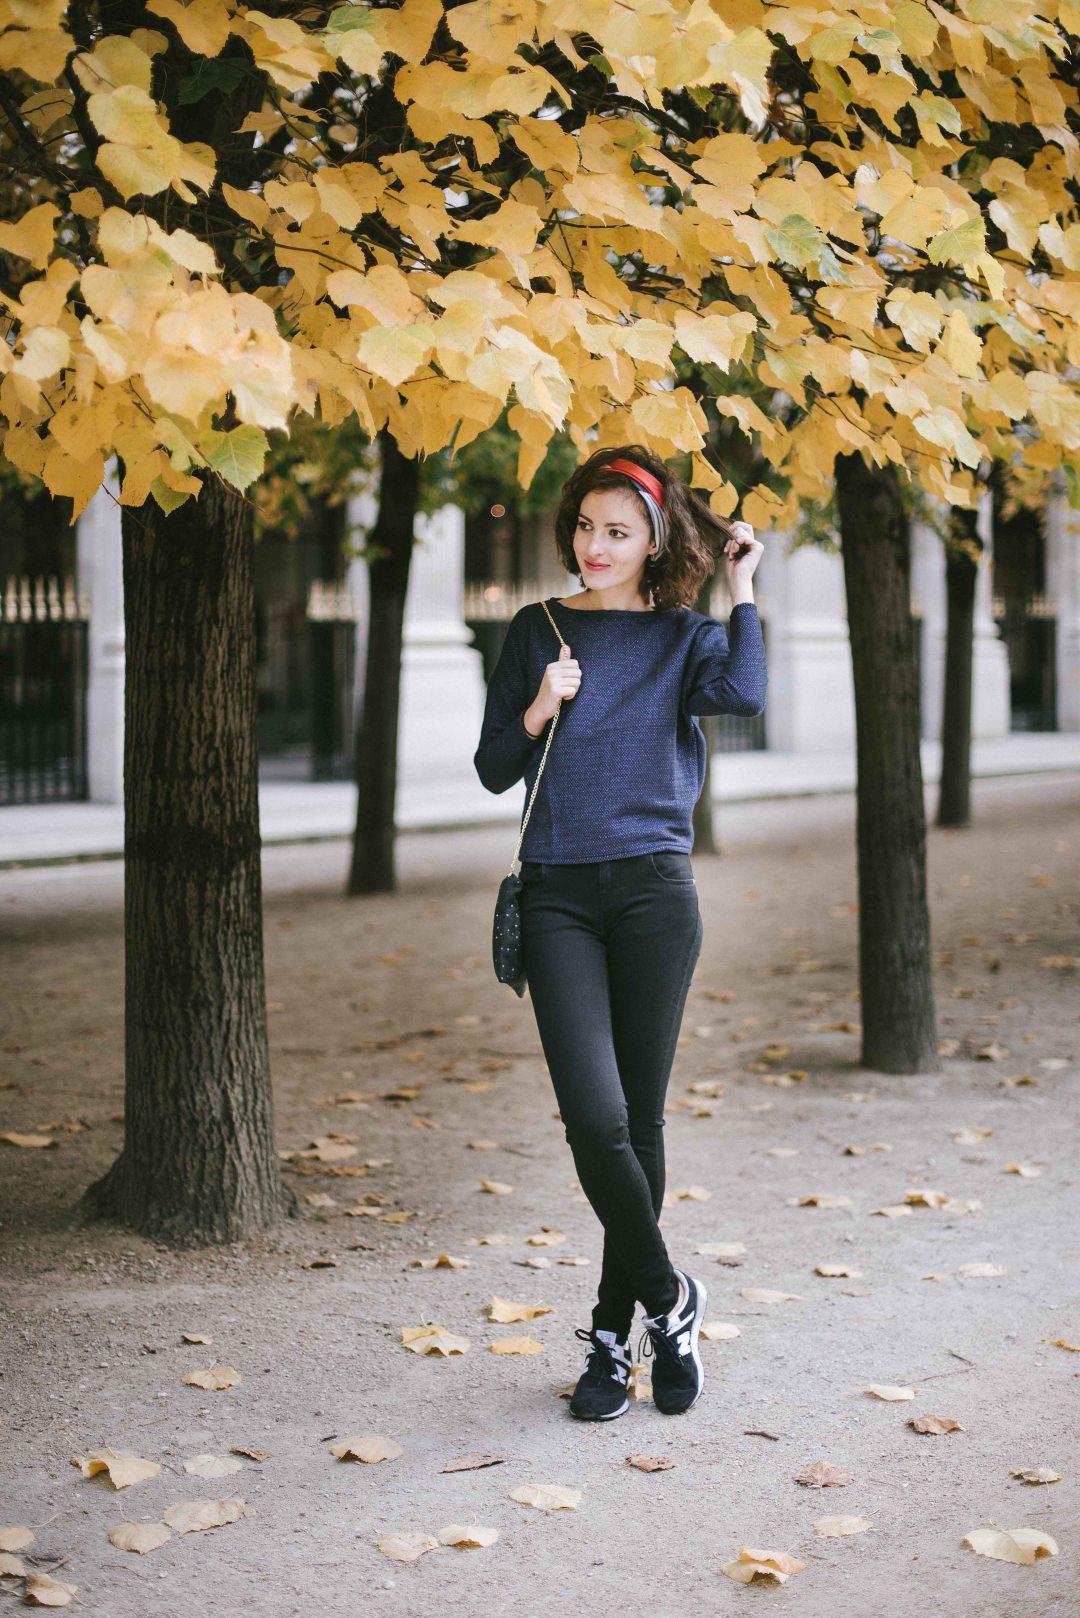 mode-dressing-responsable-copyright-marie-louise-agence-photo-sightbysight-2